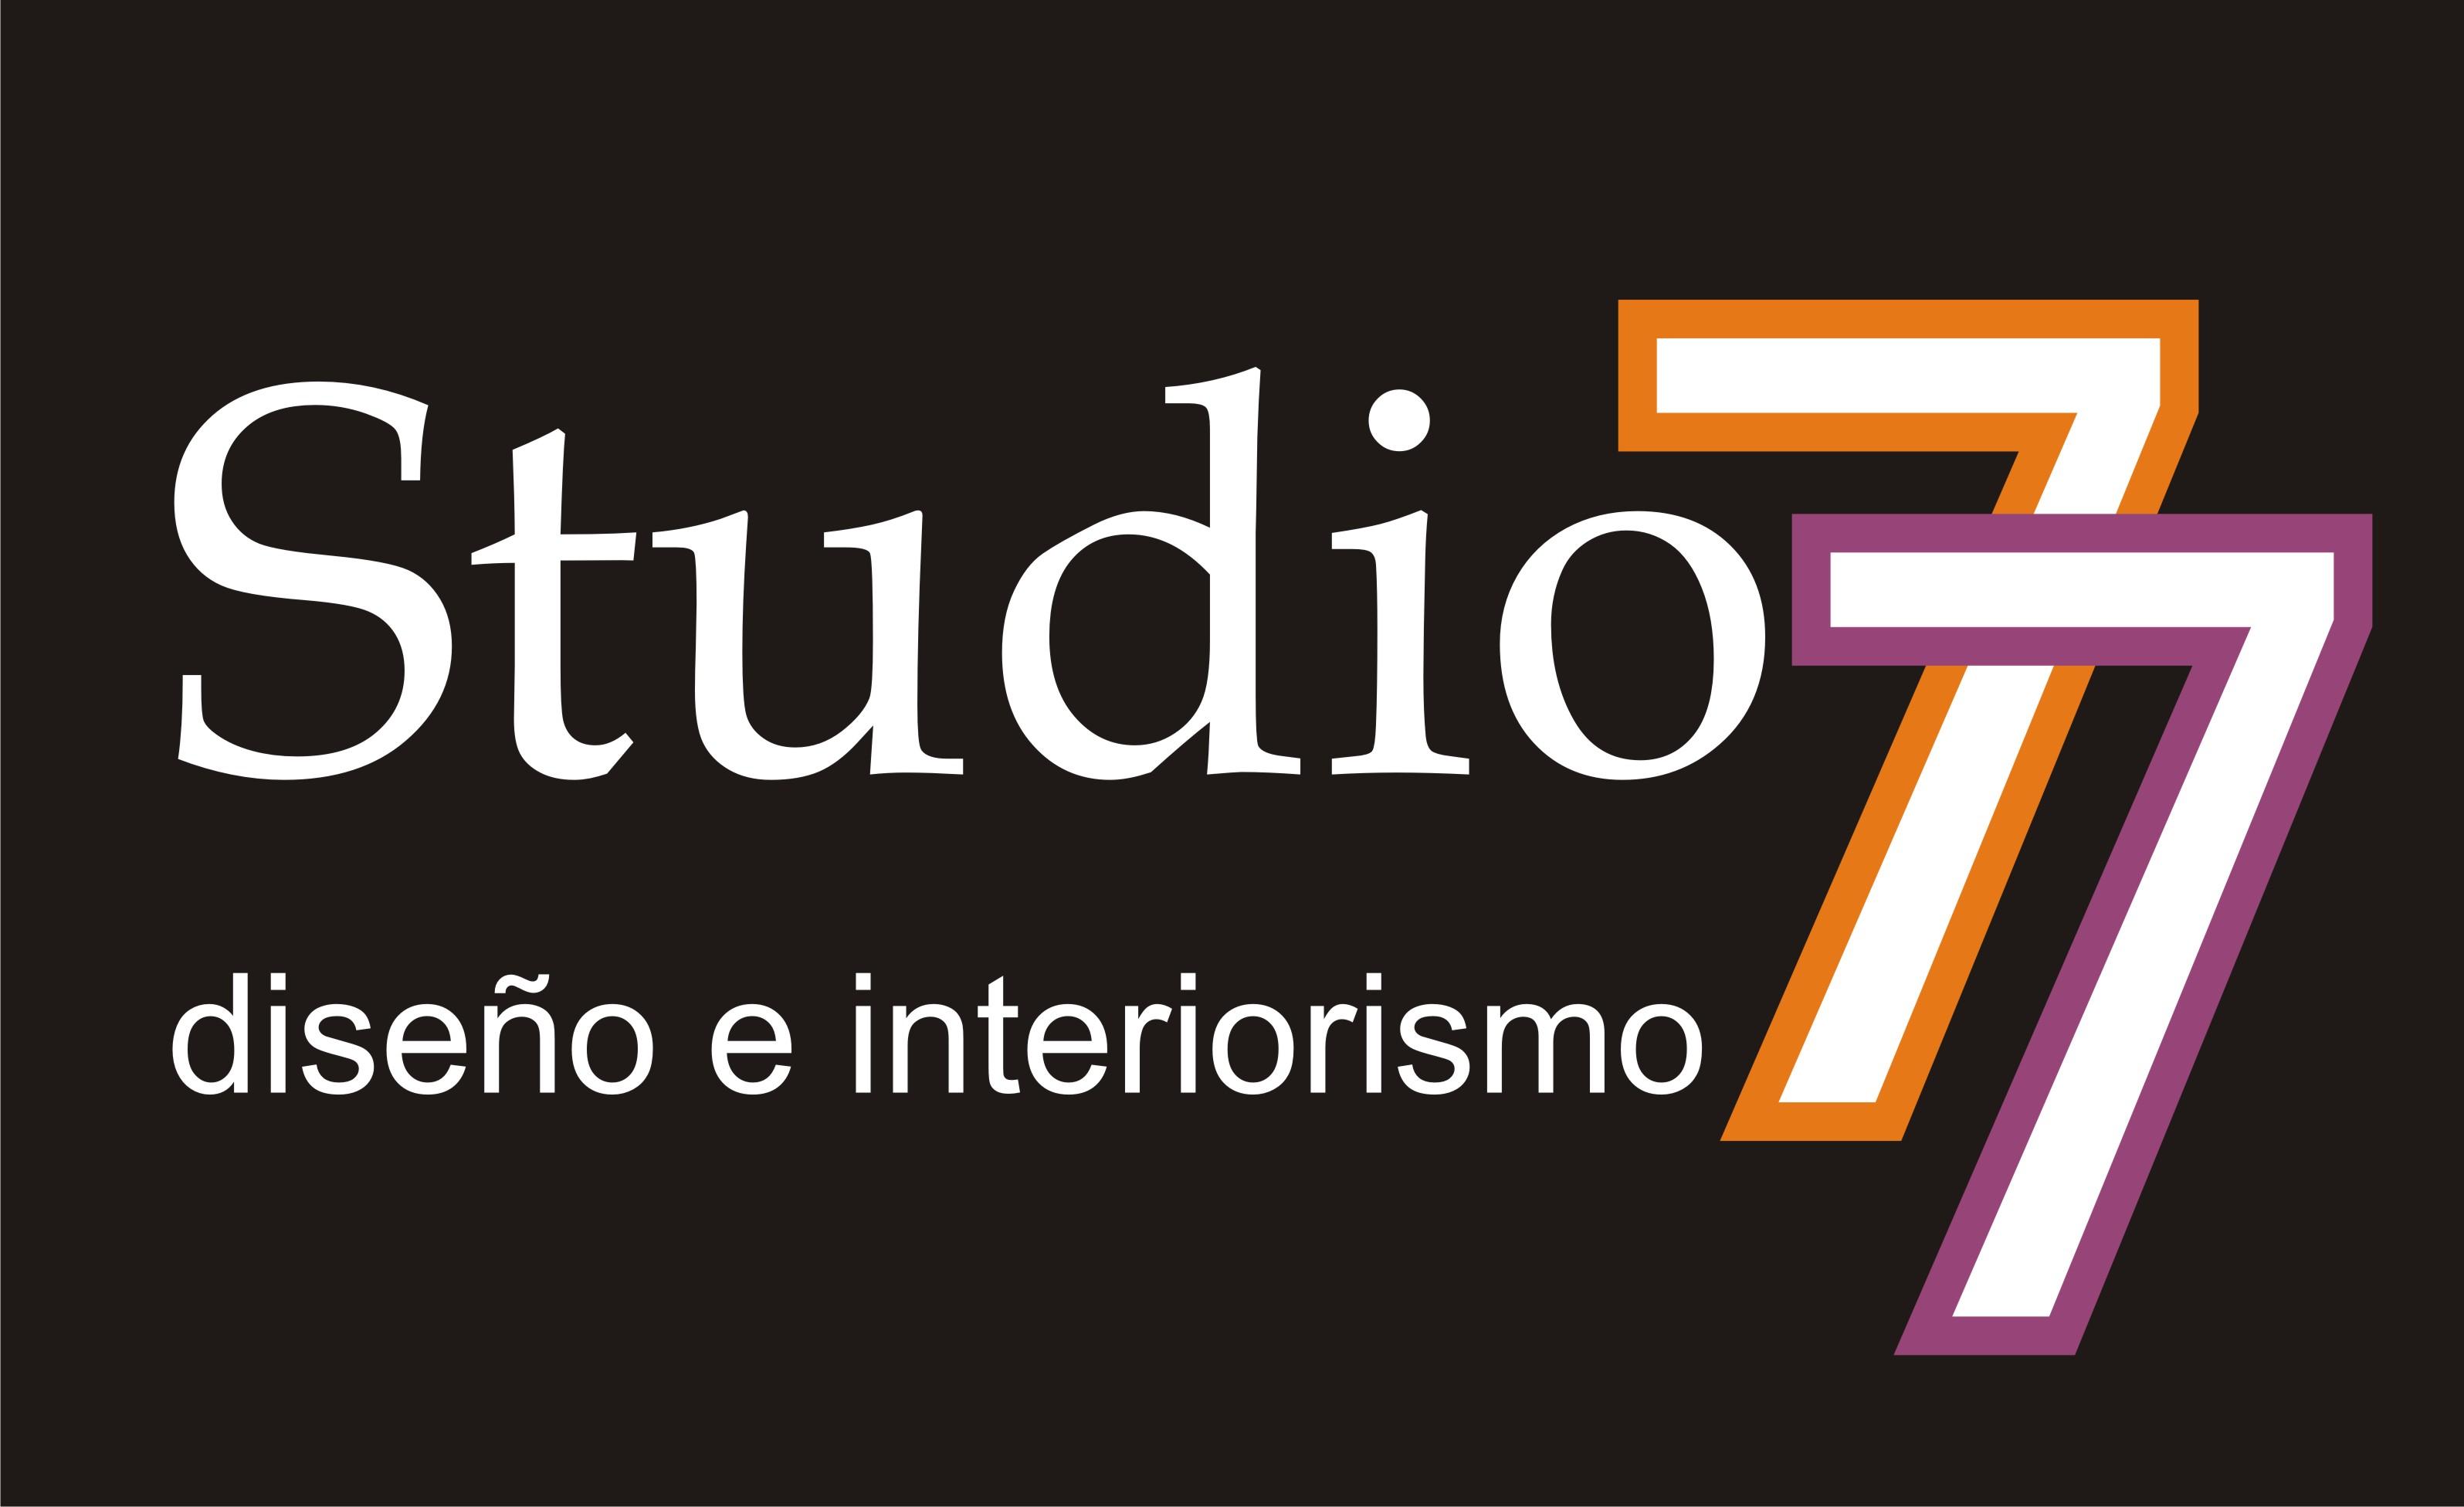 logotipo de STUDIO 77 DISEÑO E INTERIORISMO SL